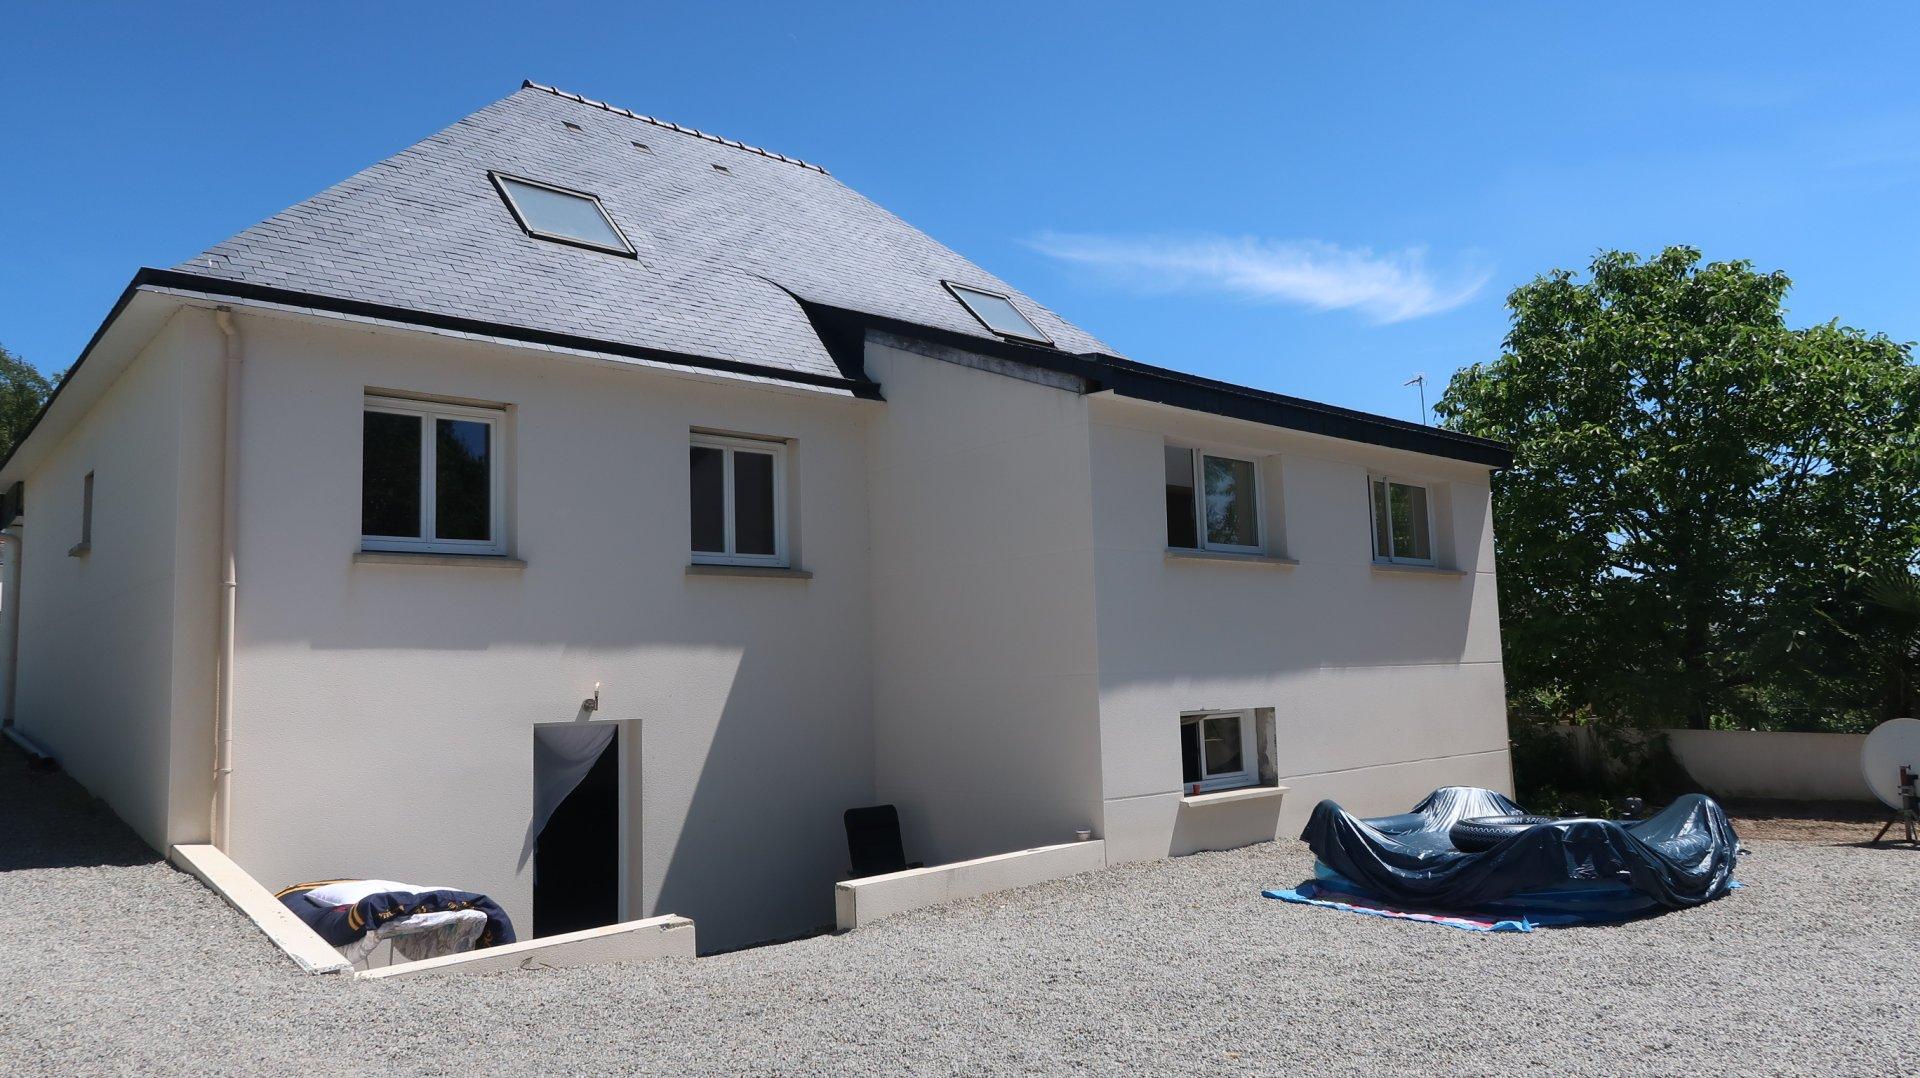 LANGUIDIC 56440 maison contemporaine de 2008 à terminer.